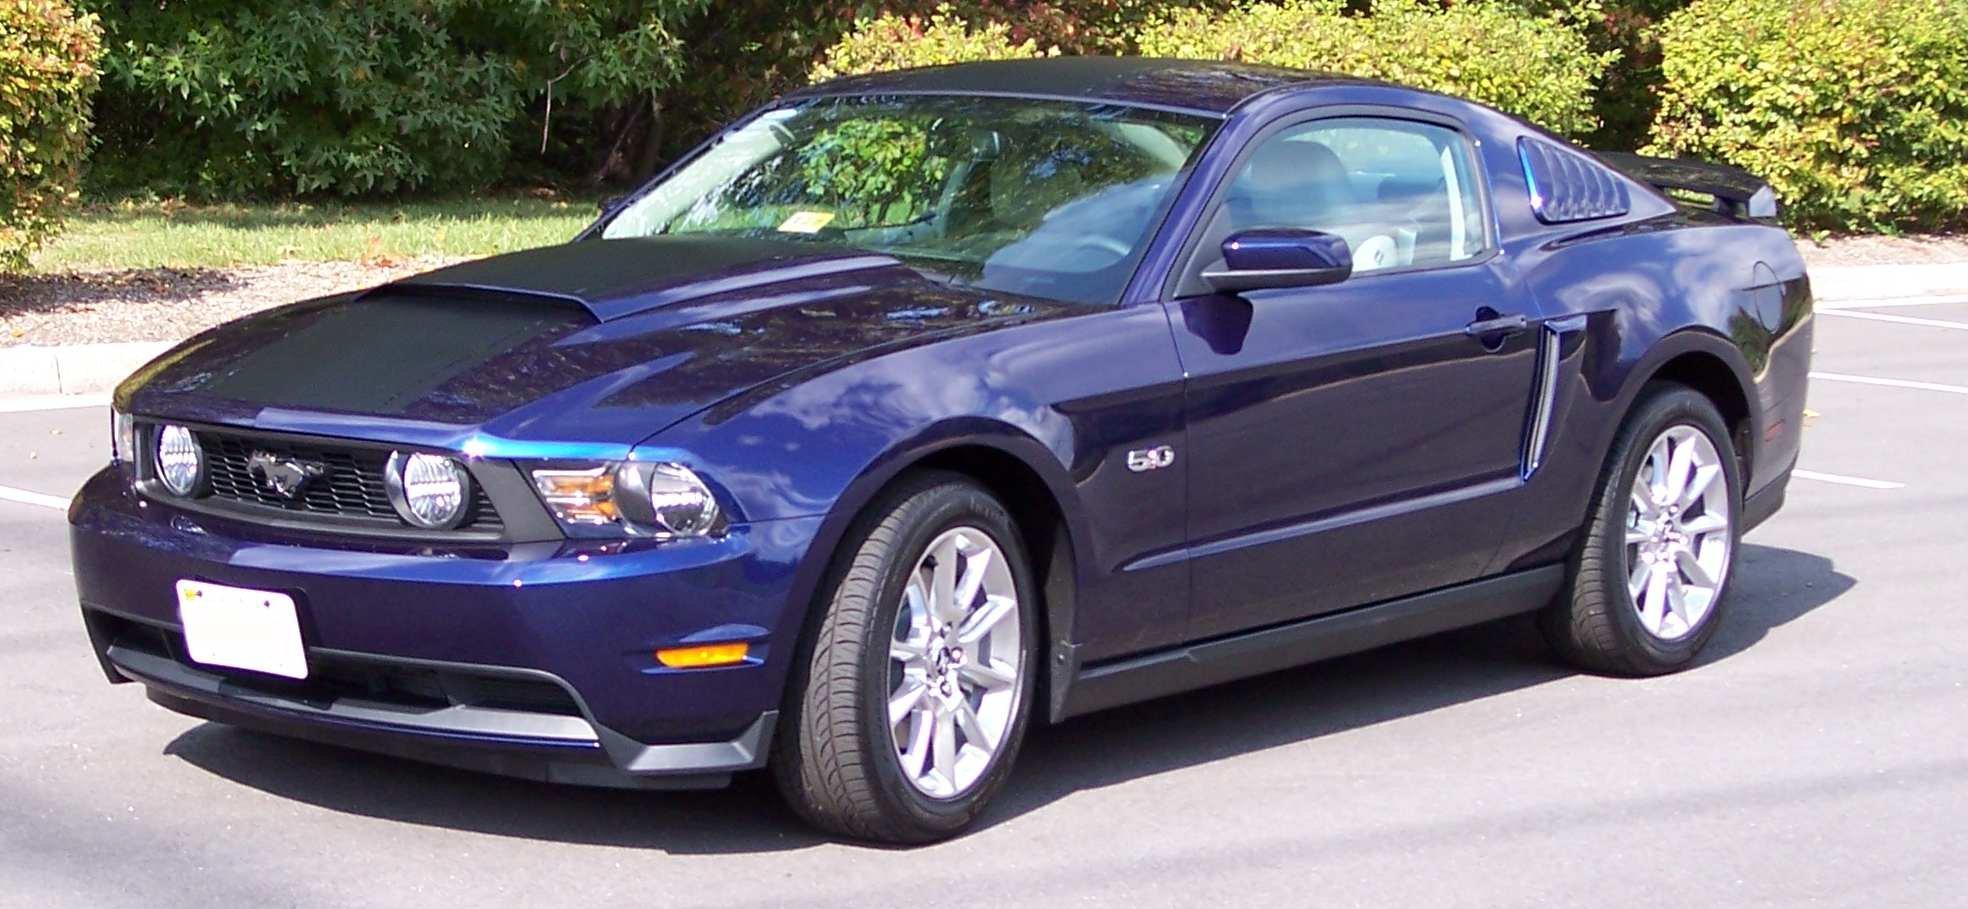 Mustang 2014 Purple